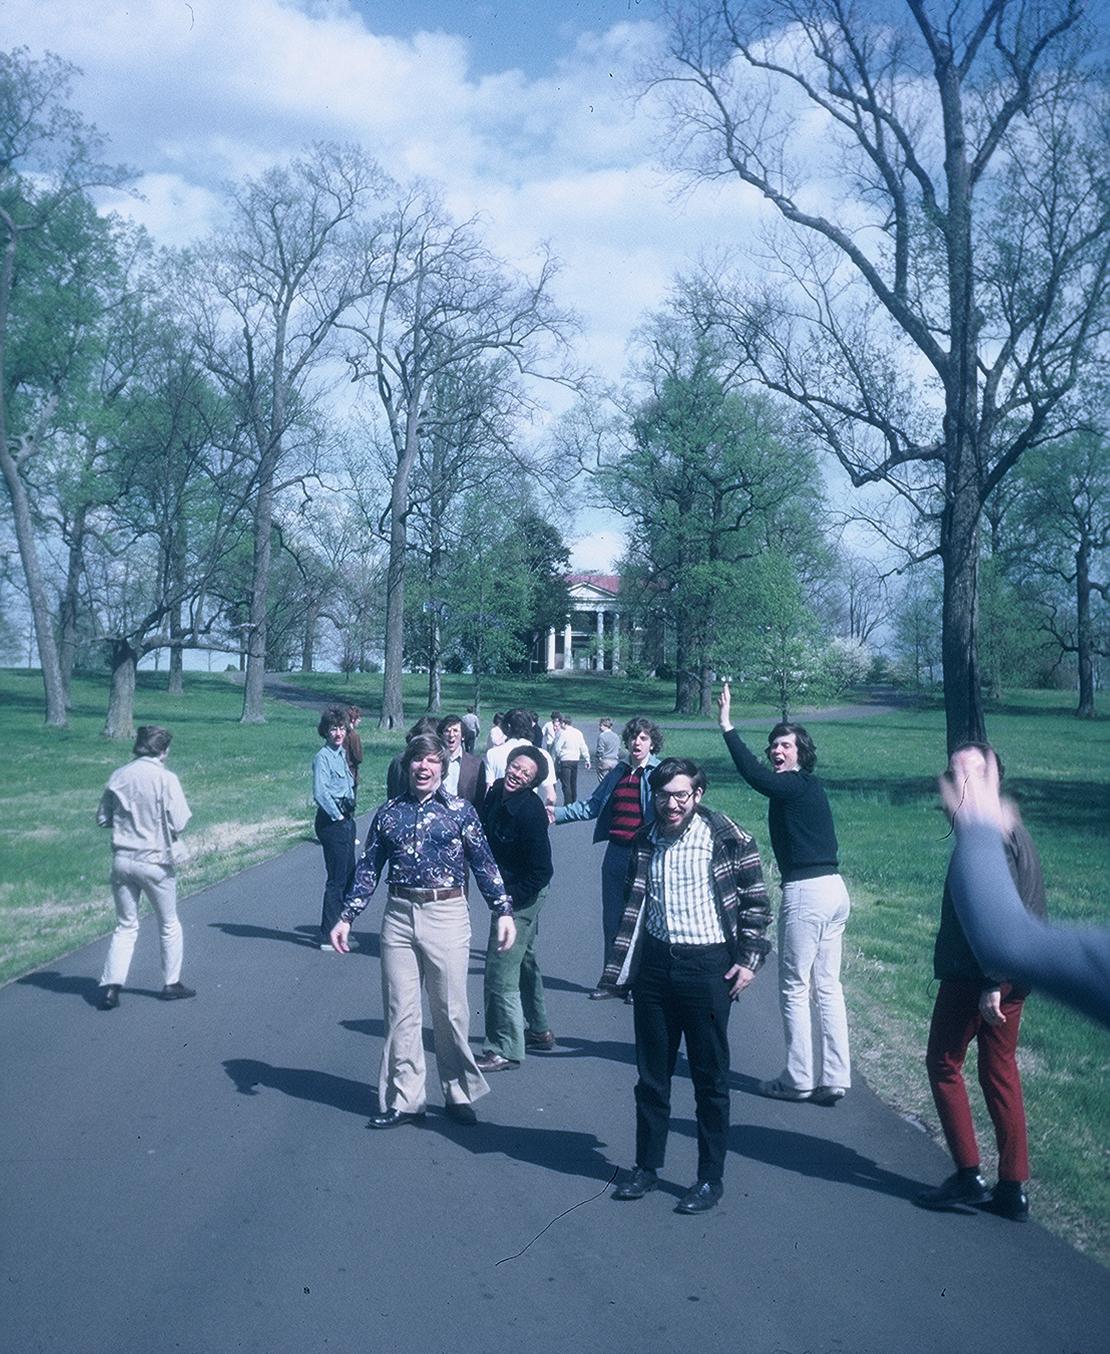 Spring_tour_1976_Monticello_staudt4-R1-E040.jpg